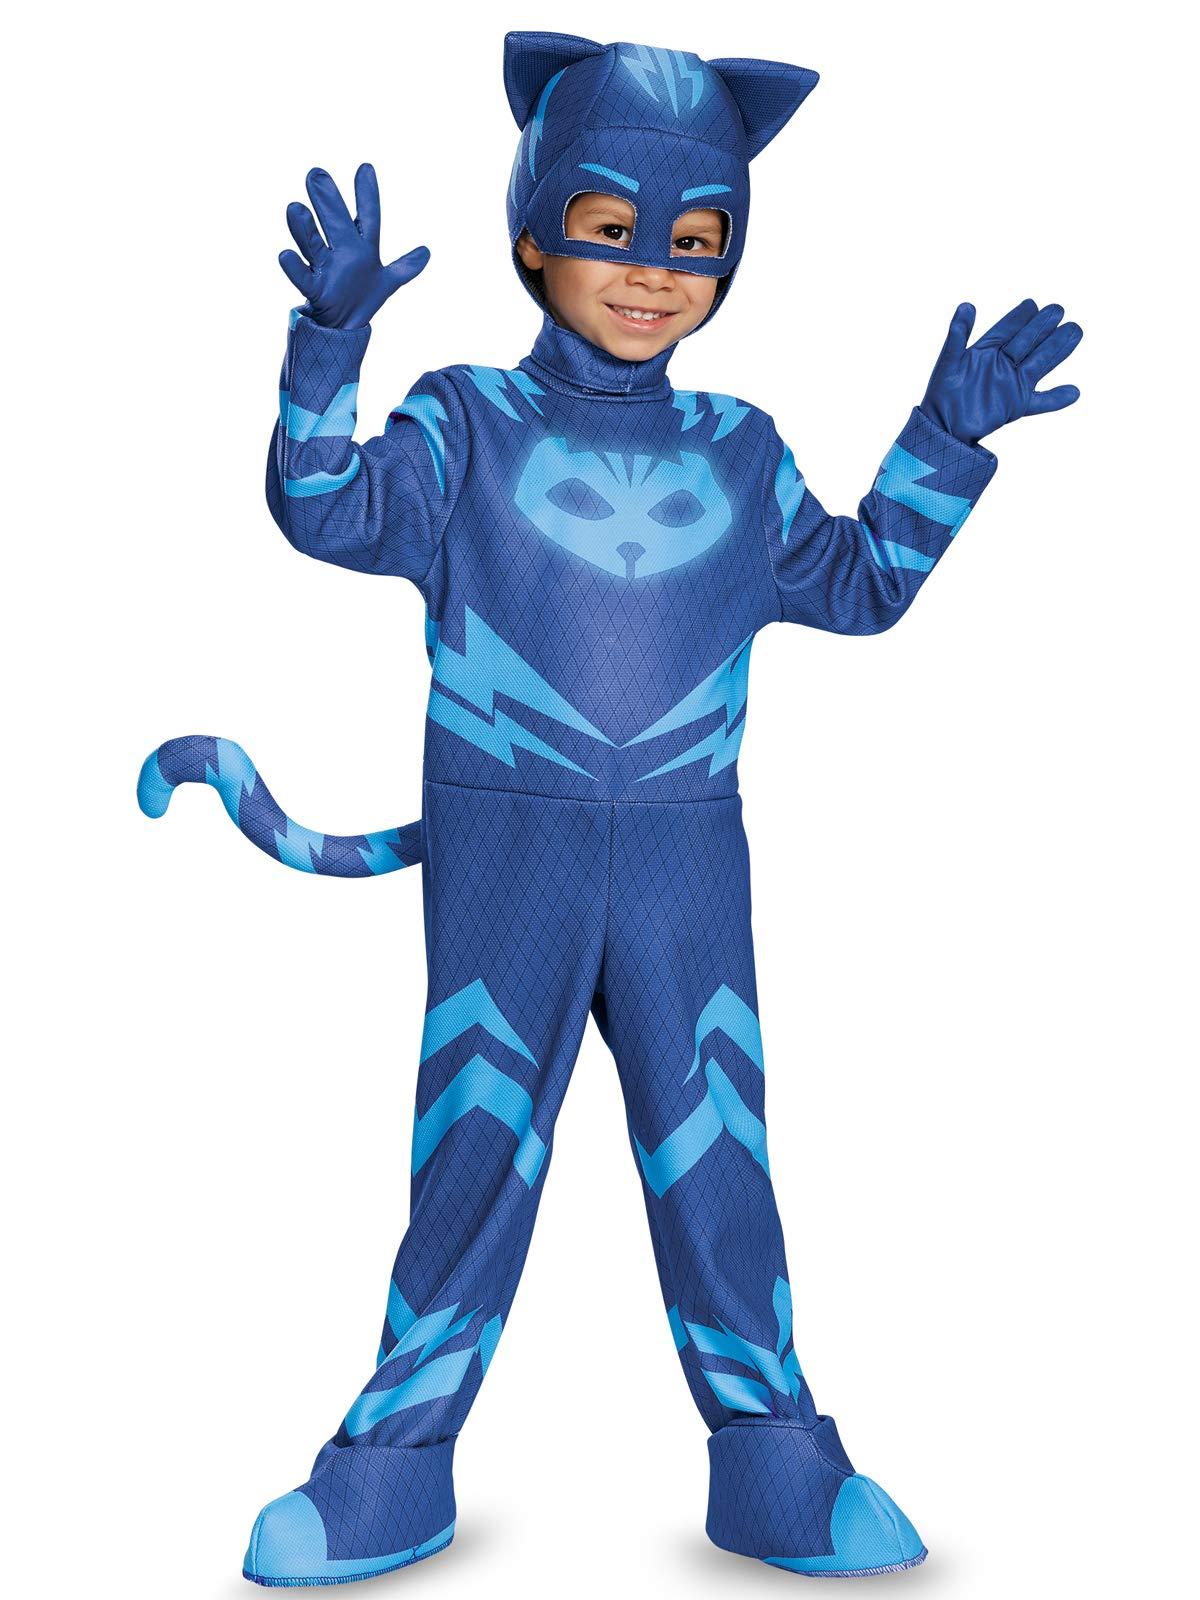 Catboy Deluxe Toddler PJ Masks Costume, Large/4-6